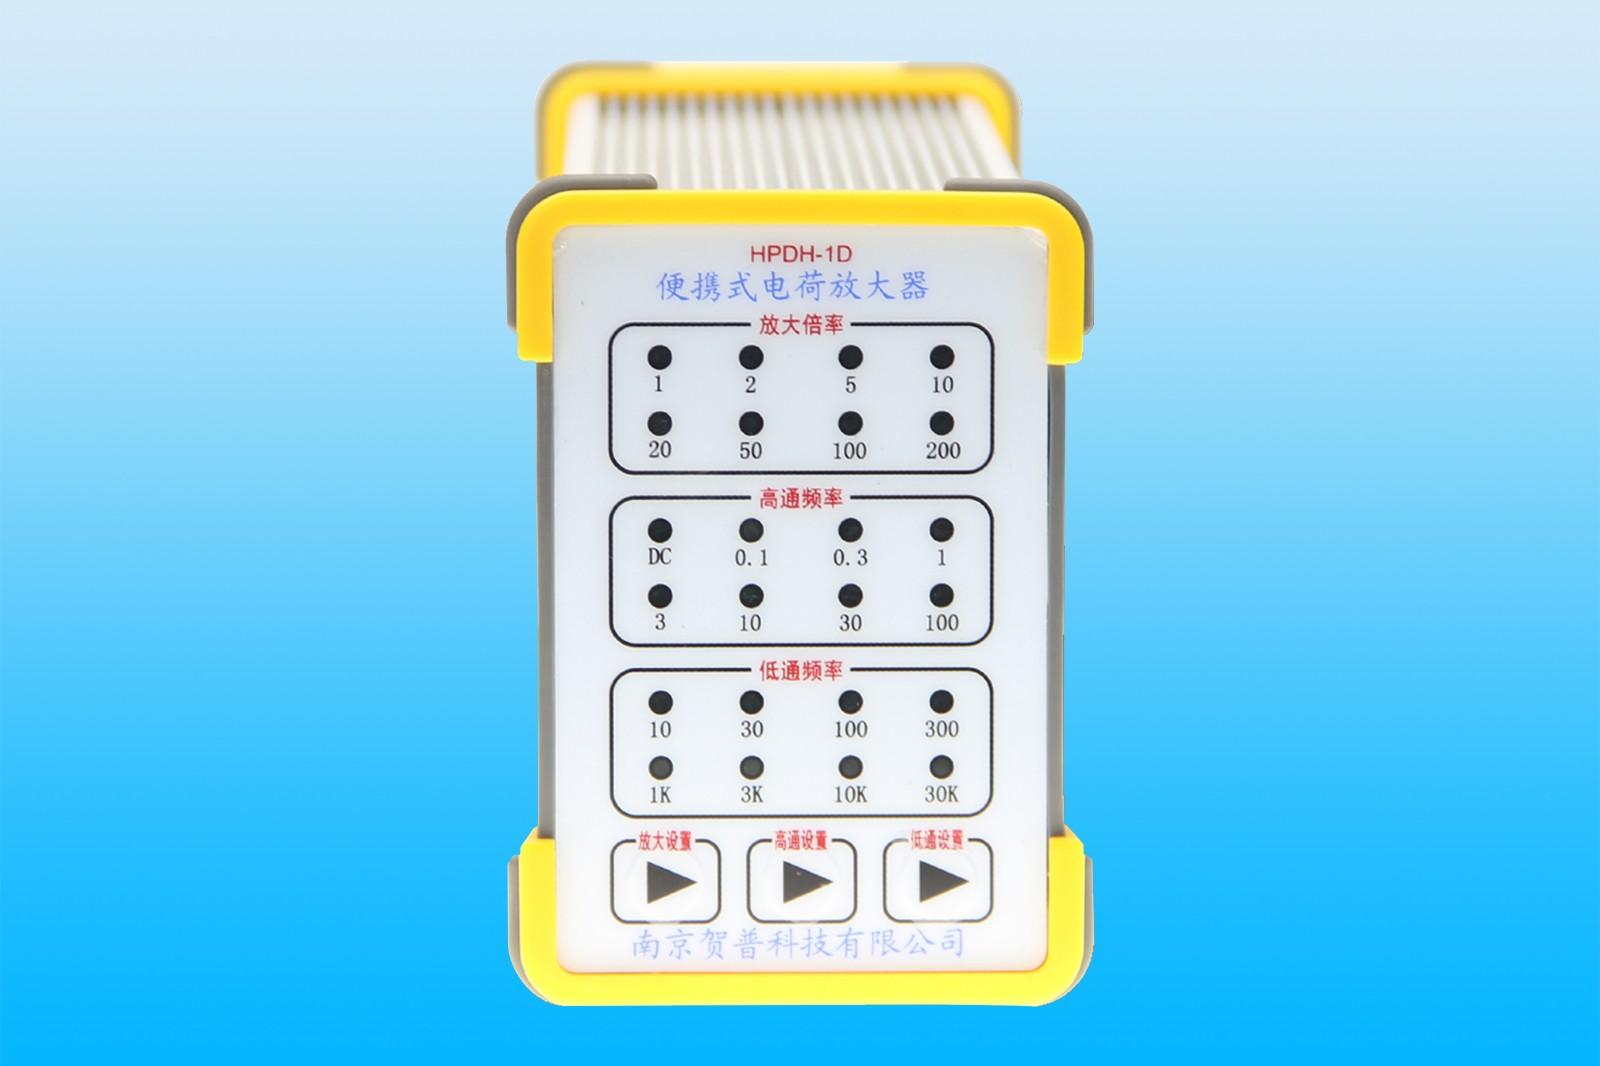 HP-DH1D 便携式电荷放大器